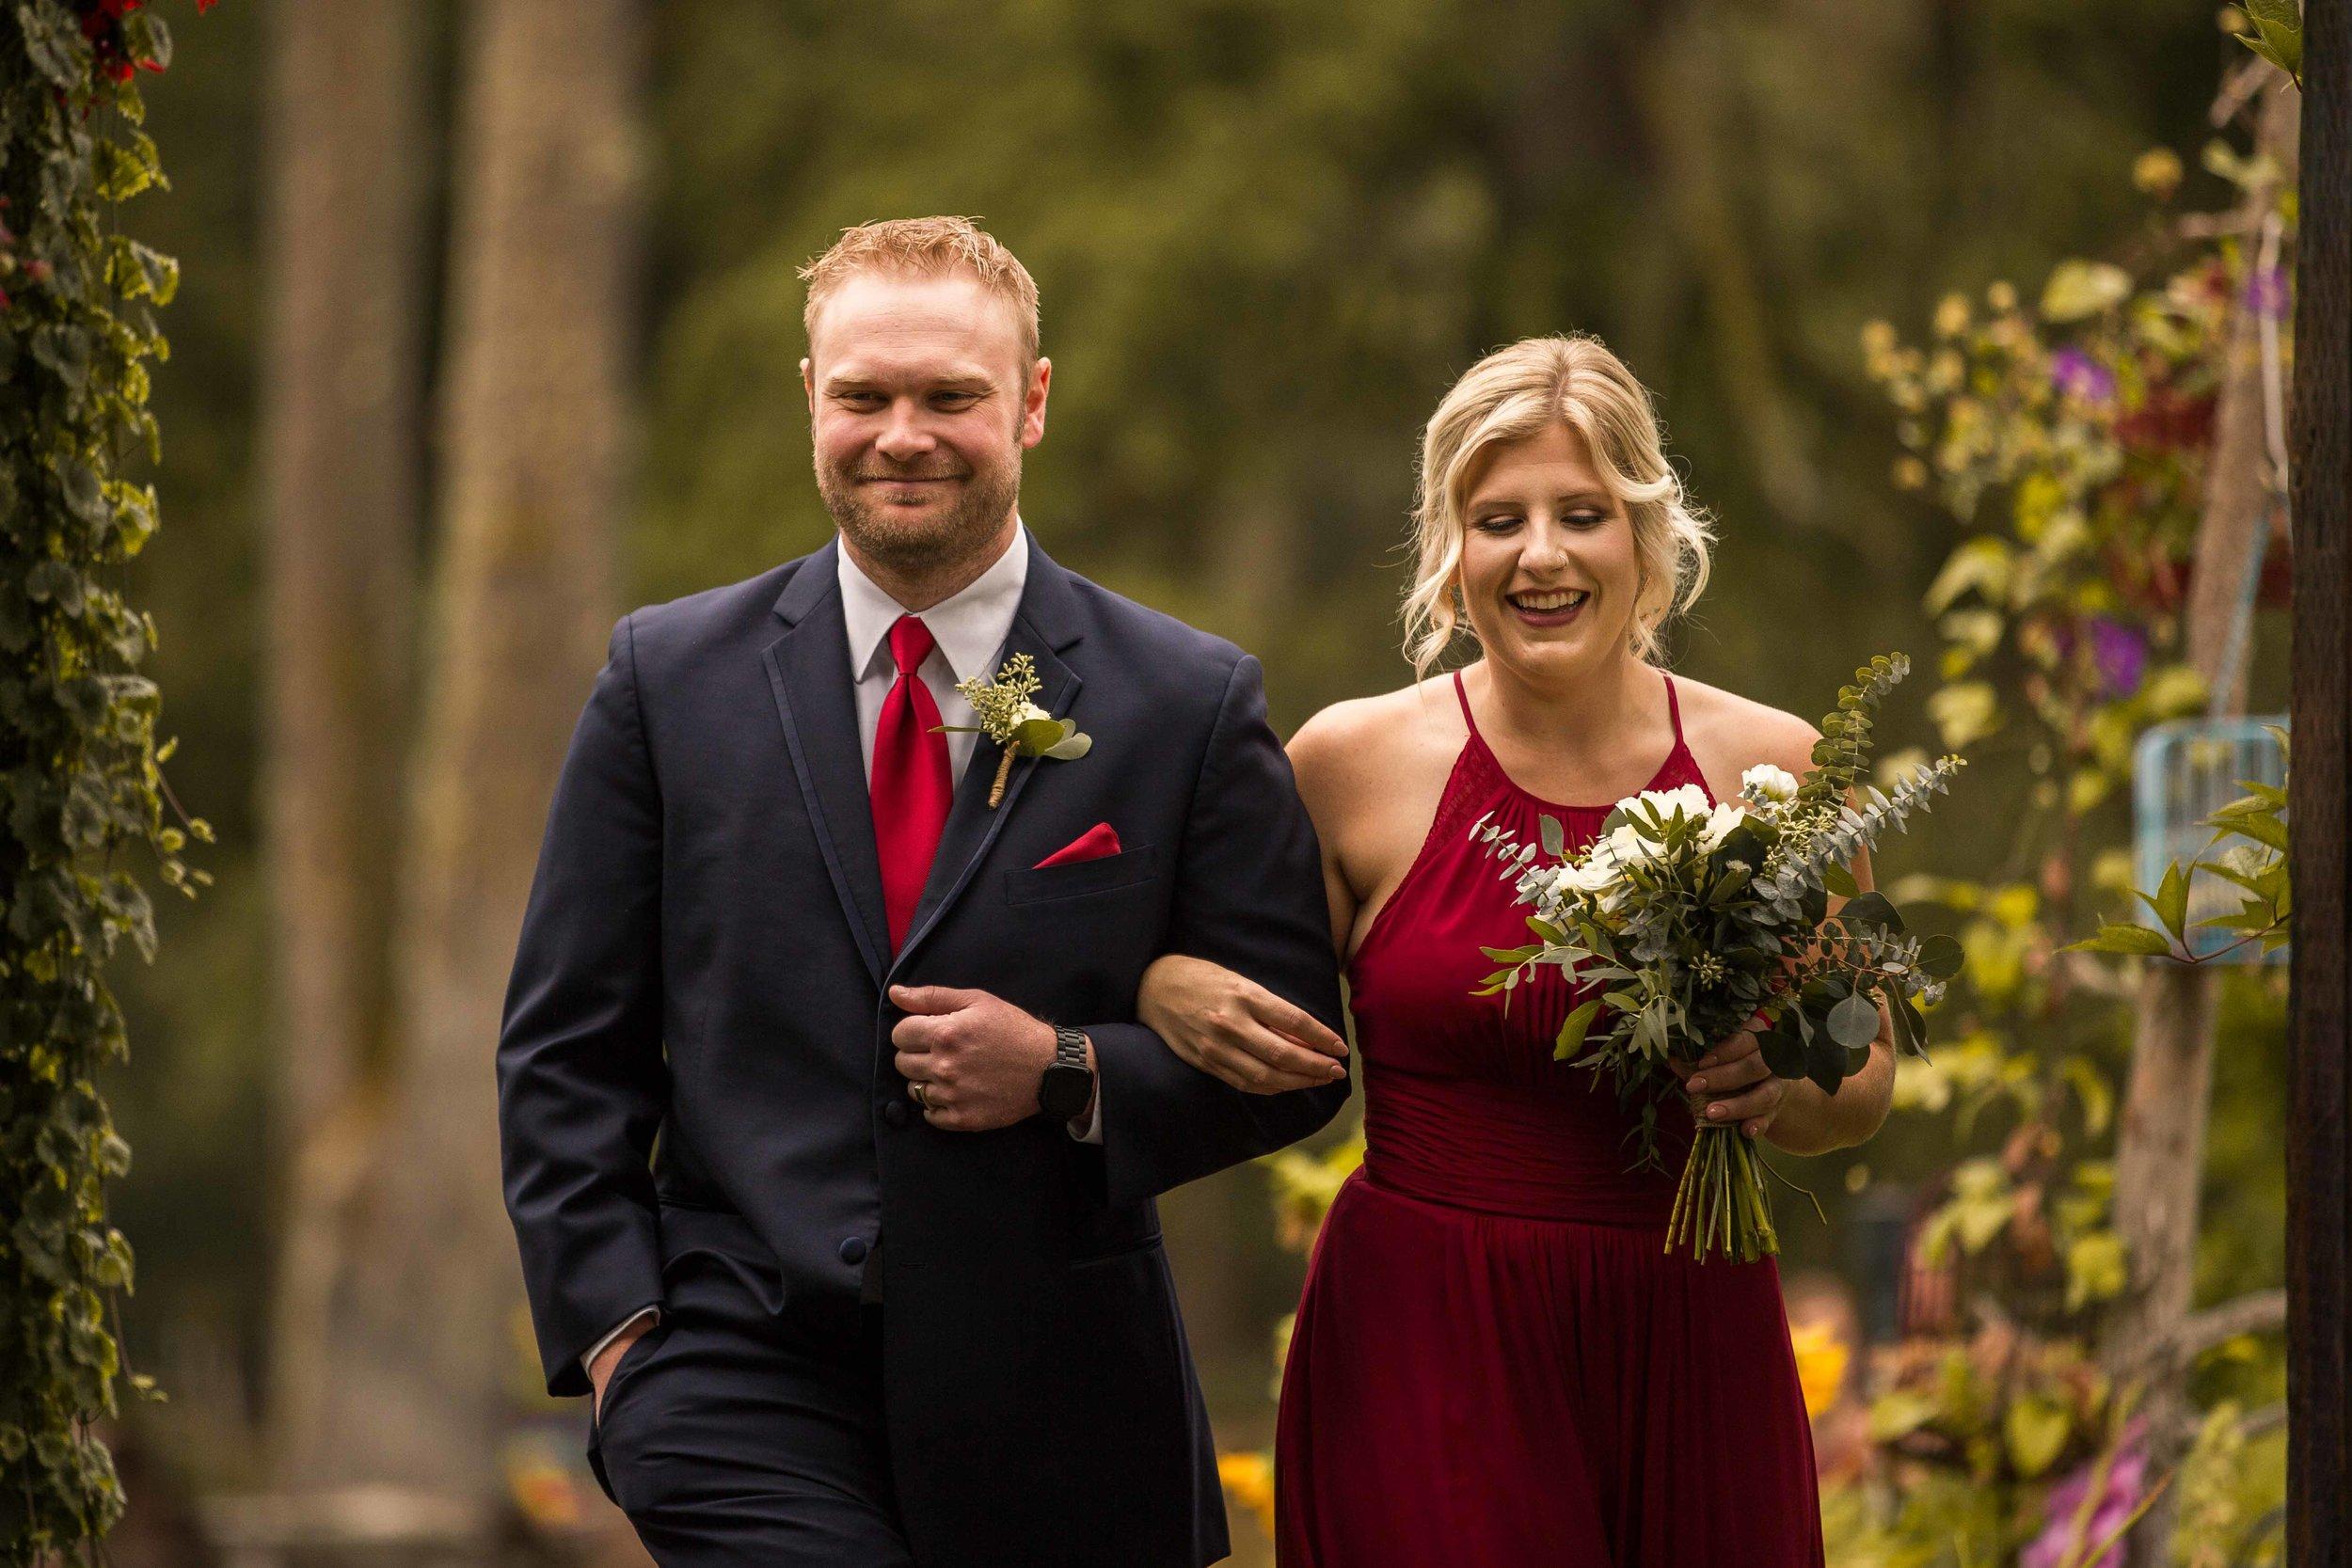 Ceremony Heather and Zac - DillonVibes Photography-7.jpg